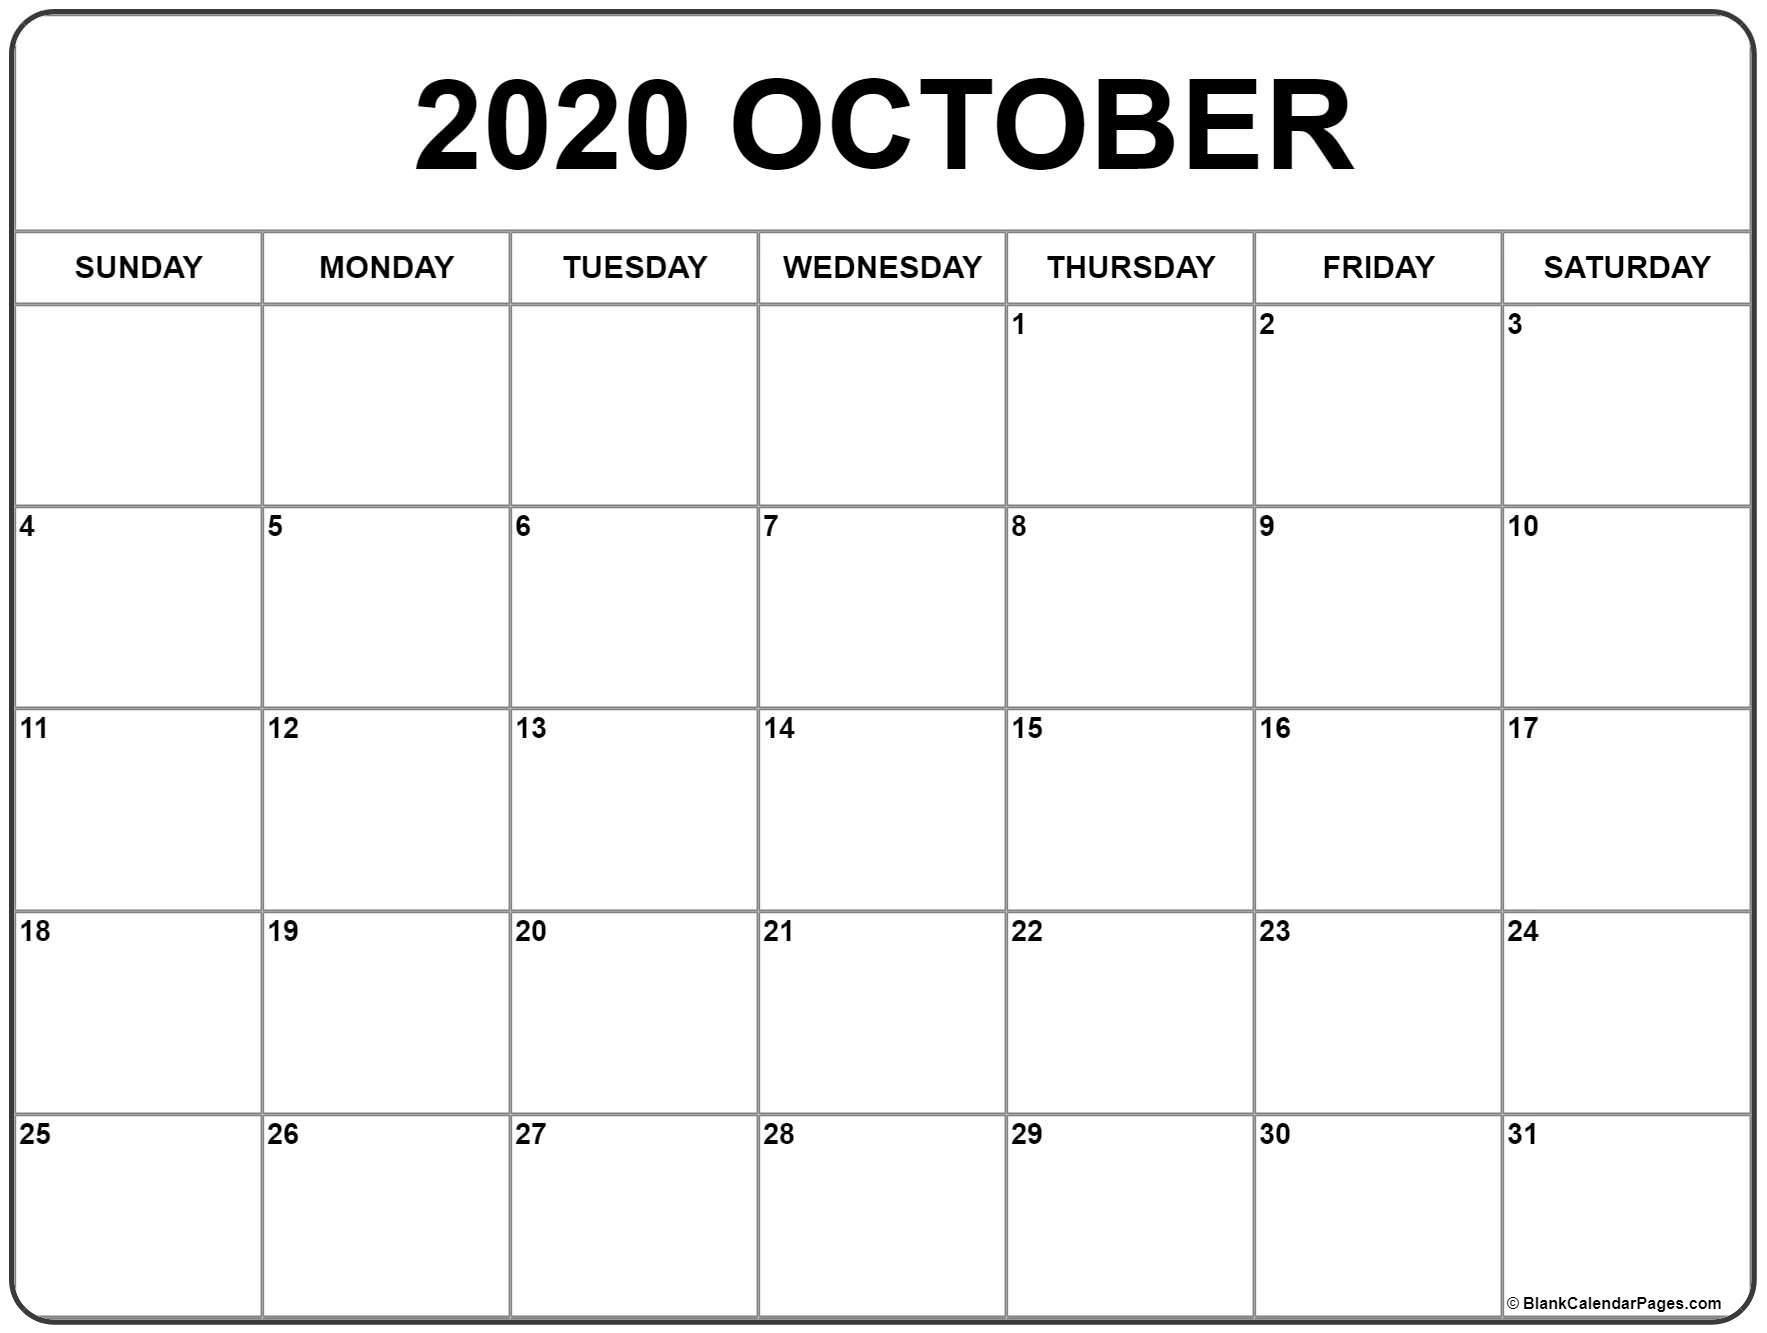 October 2020 Calendar   Free Printable Monthly Calendars